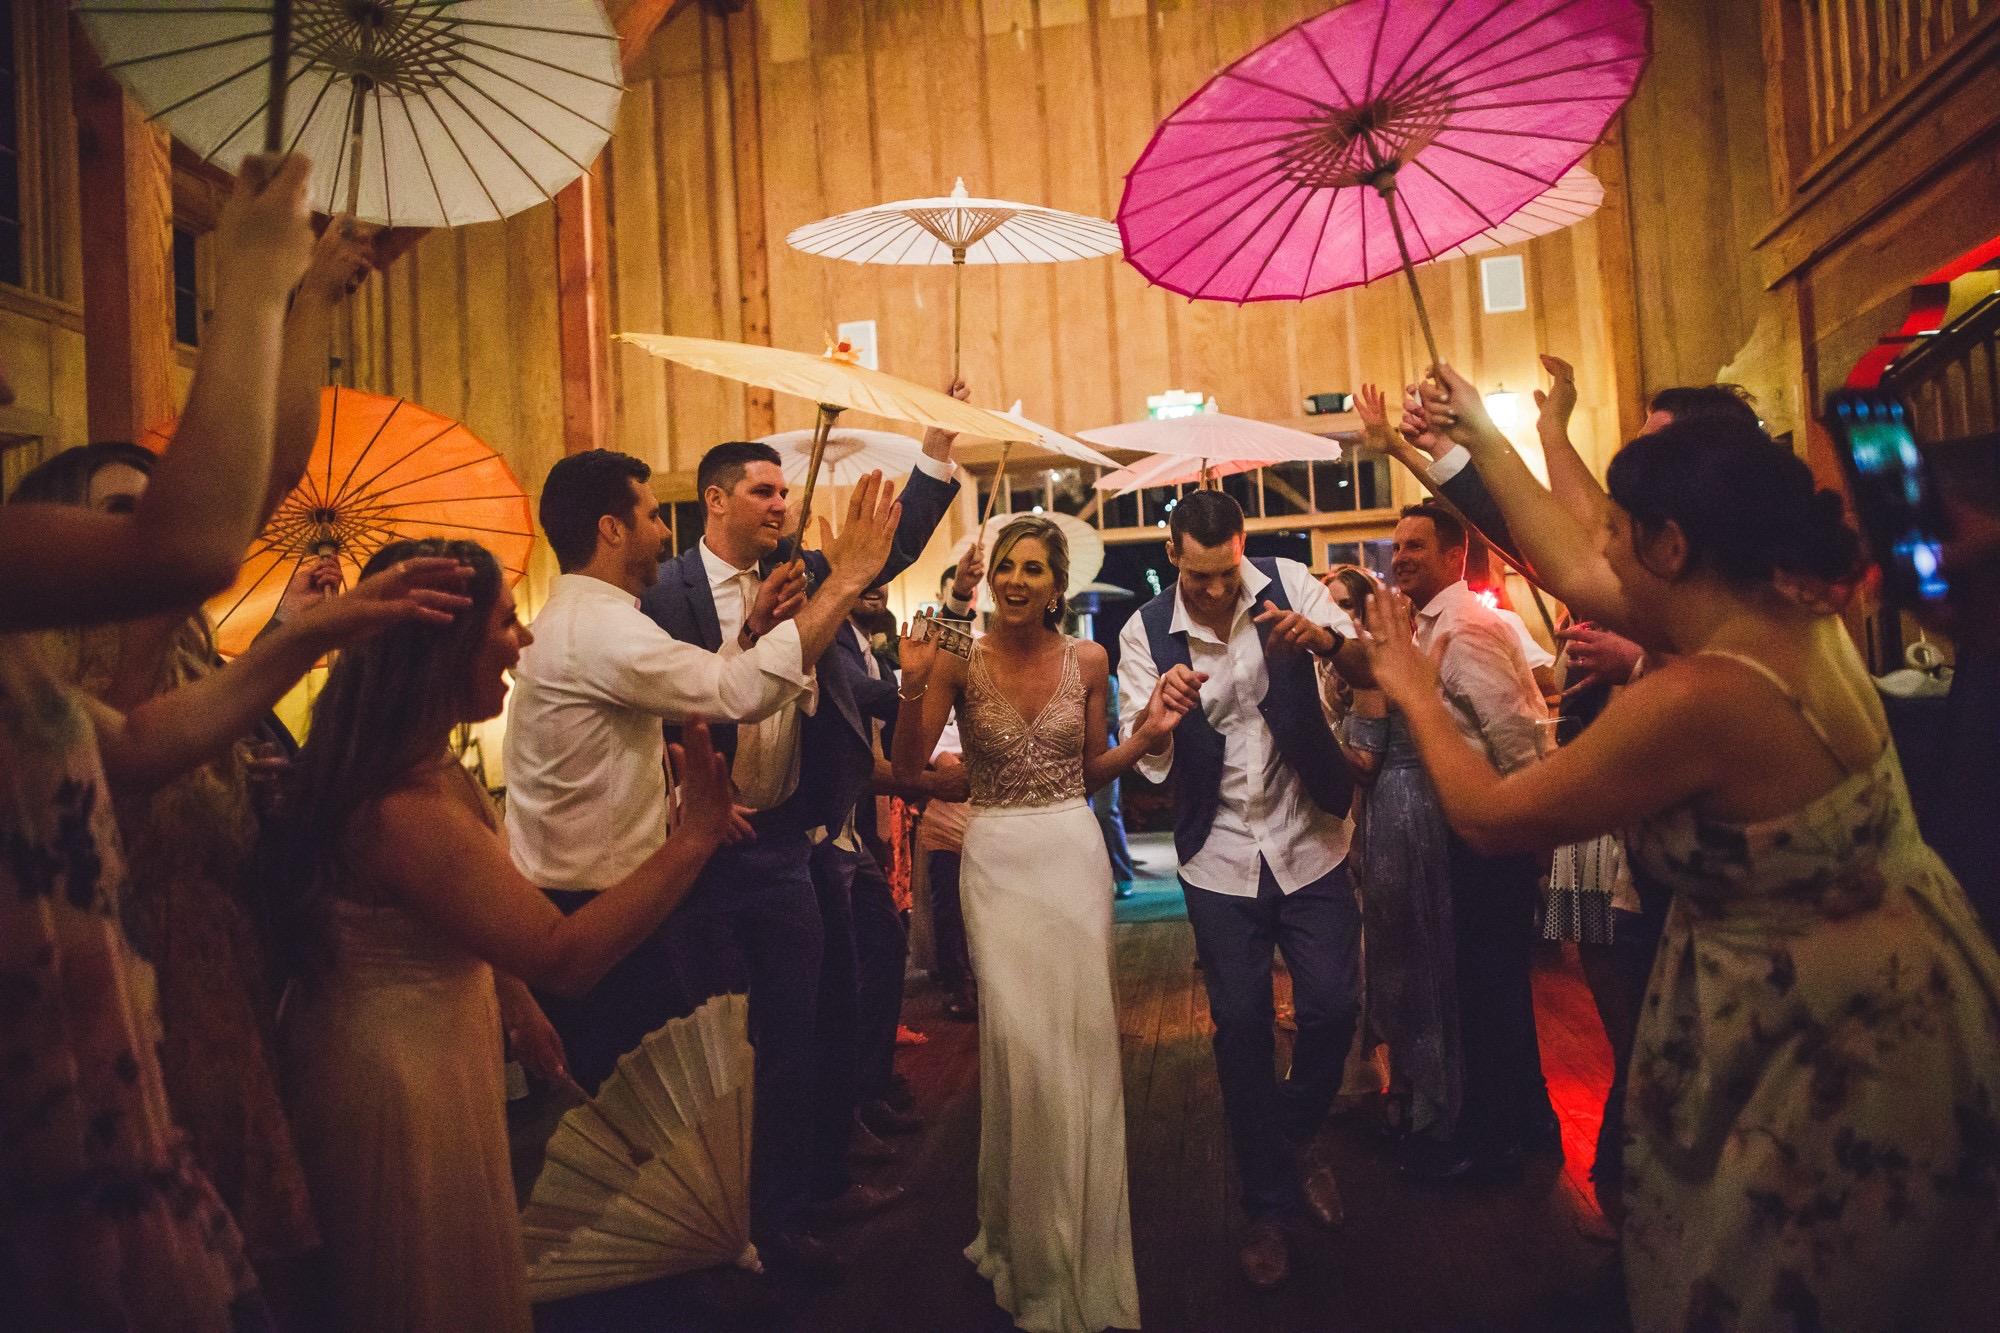 Los Gatos DJ - Nestldown Wedding - Grand Exit from the Barn